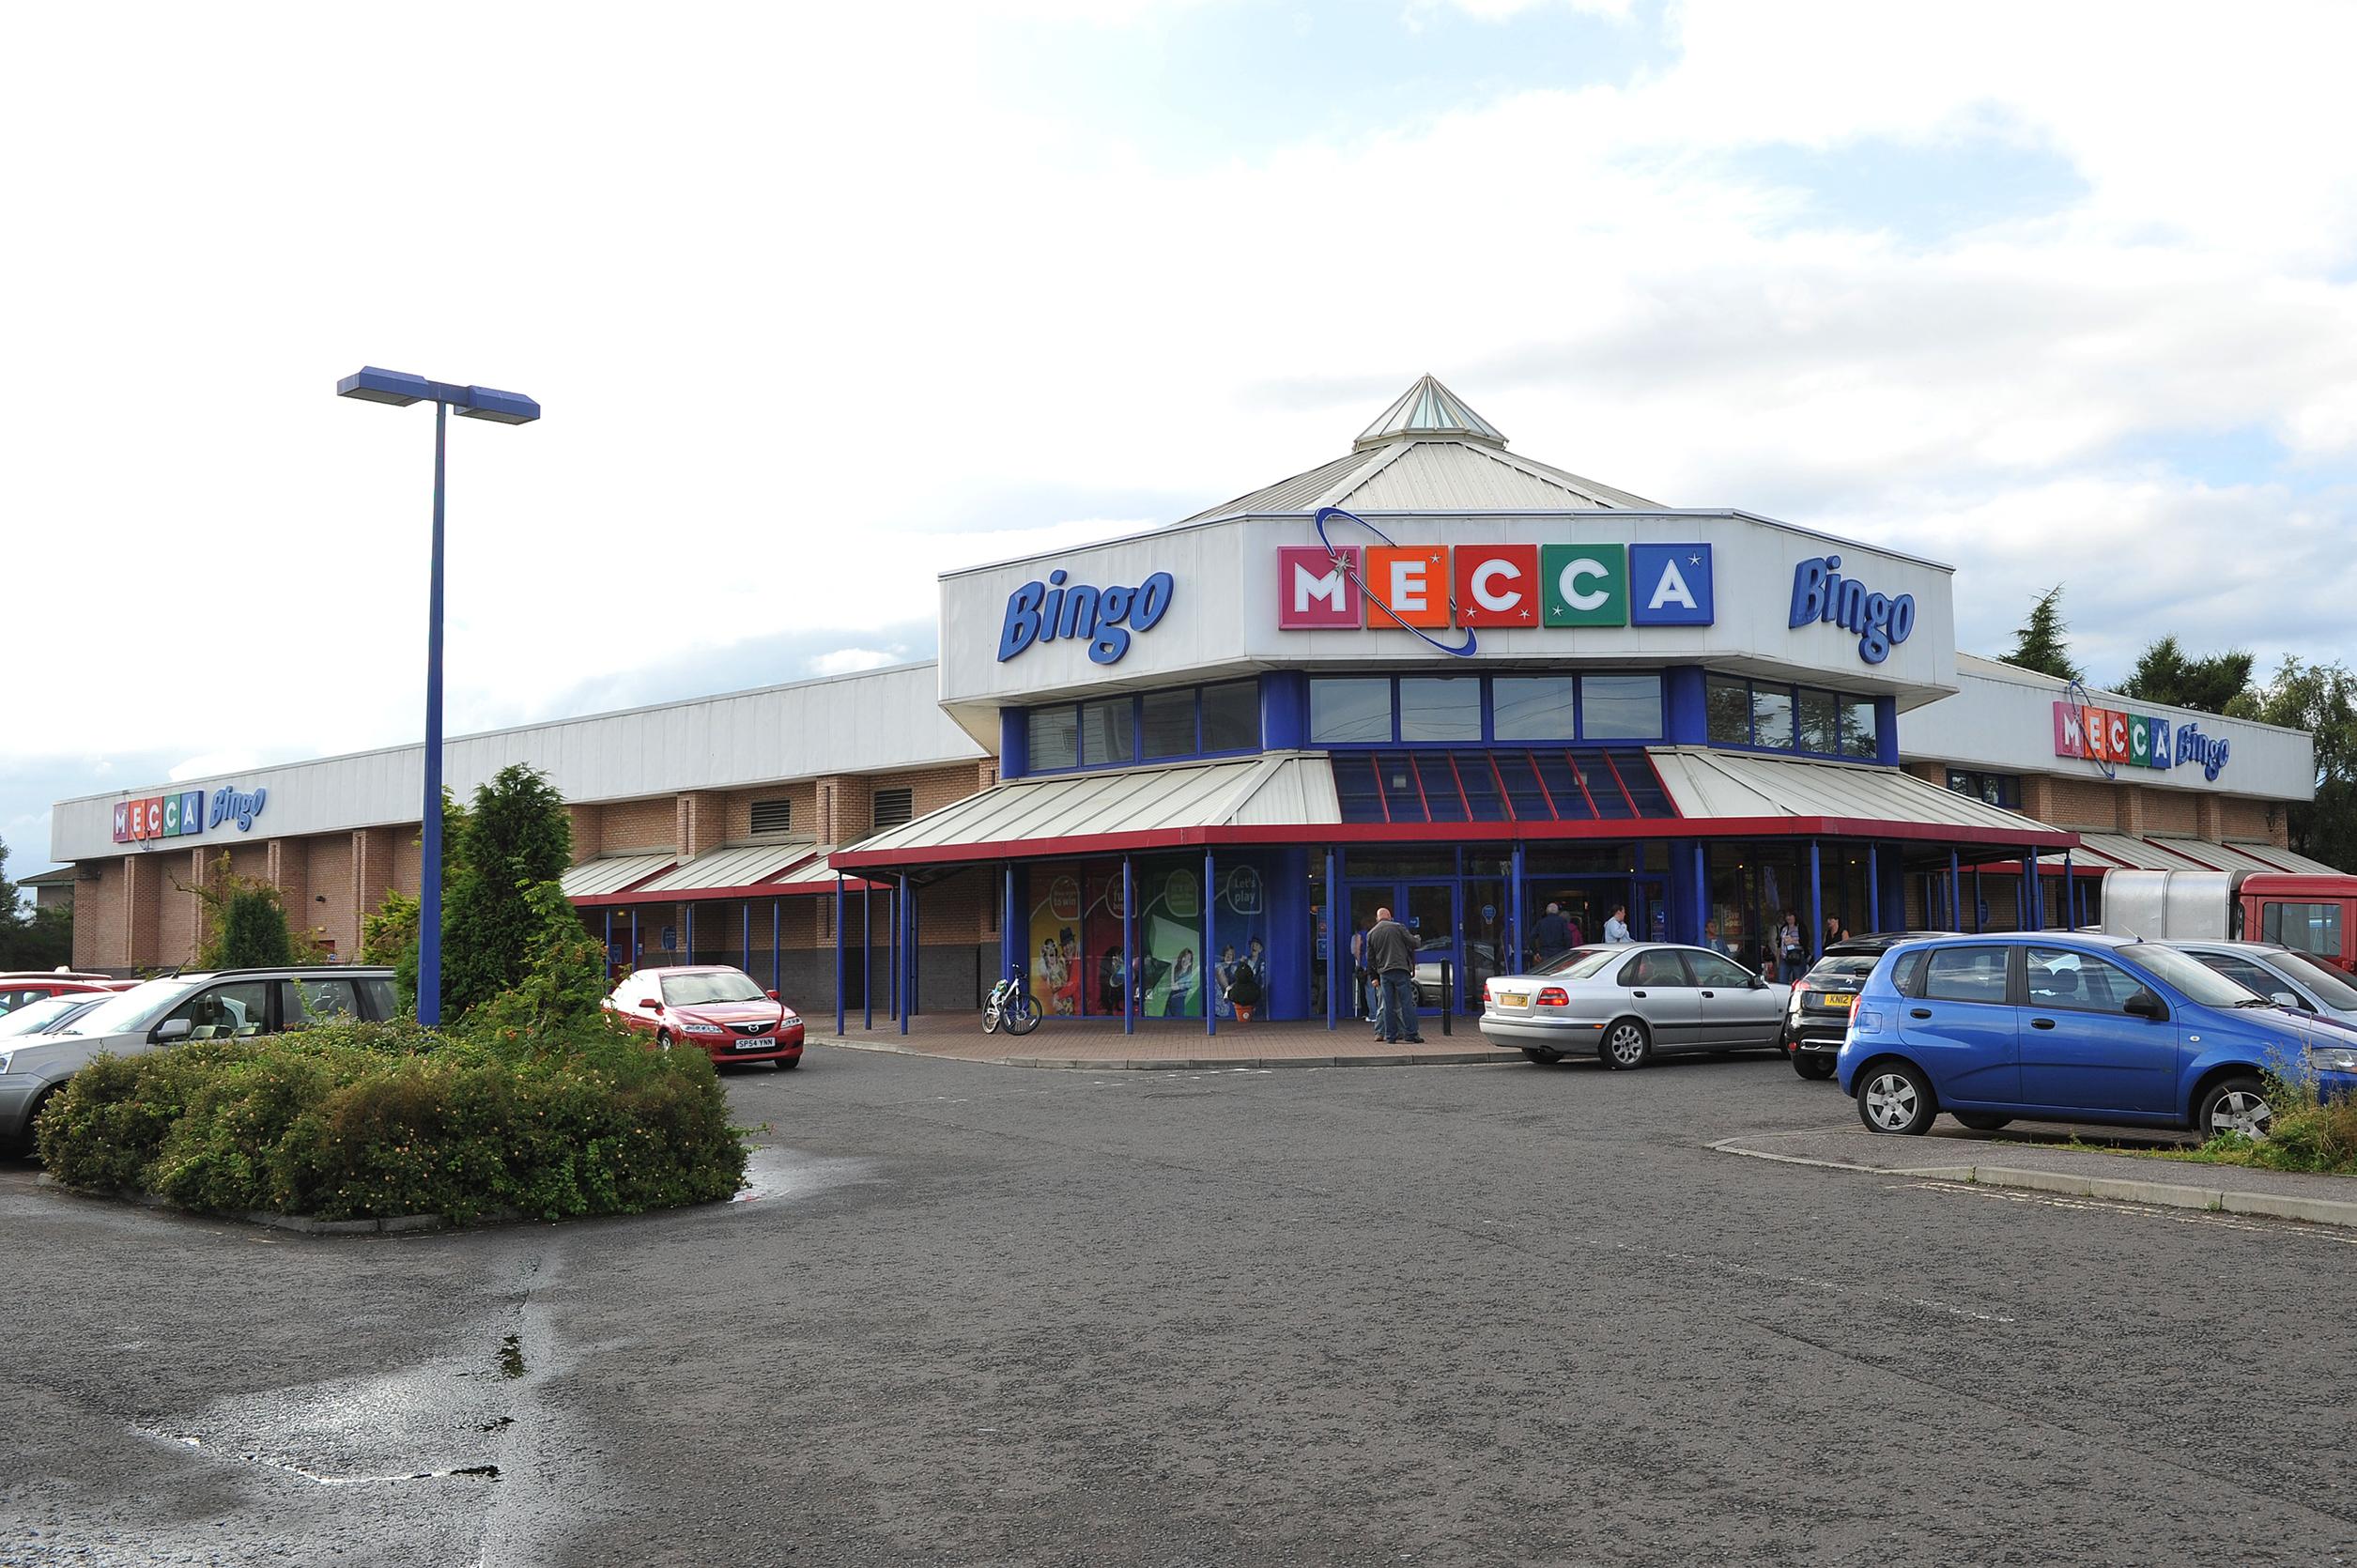 Mecca Bingo in Douglasfield, Dundee